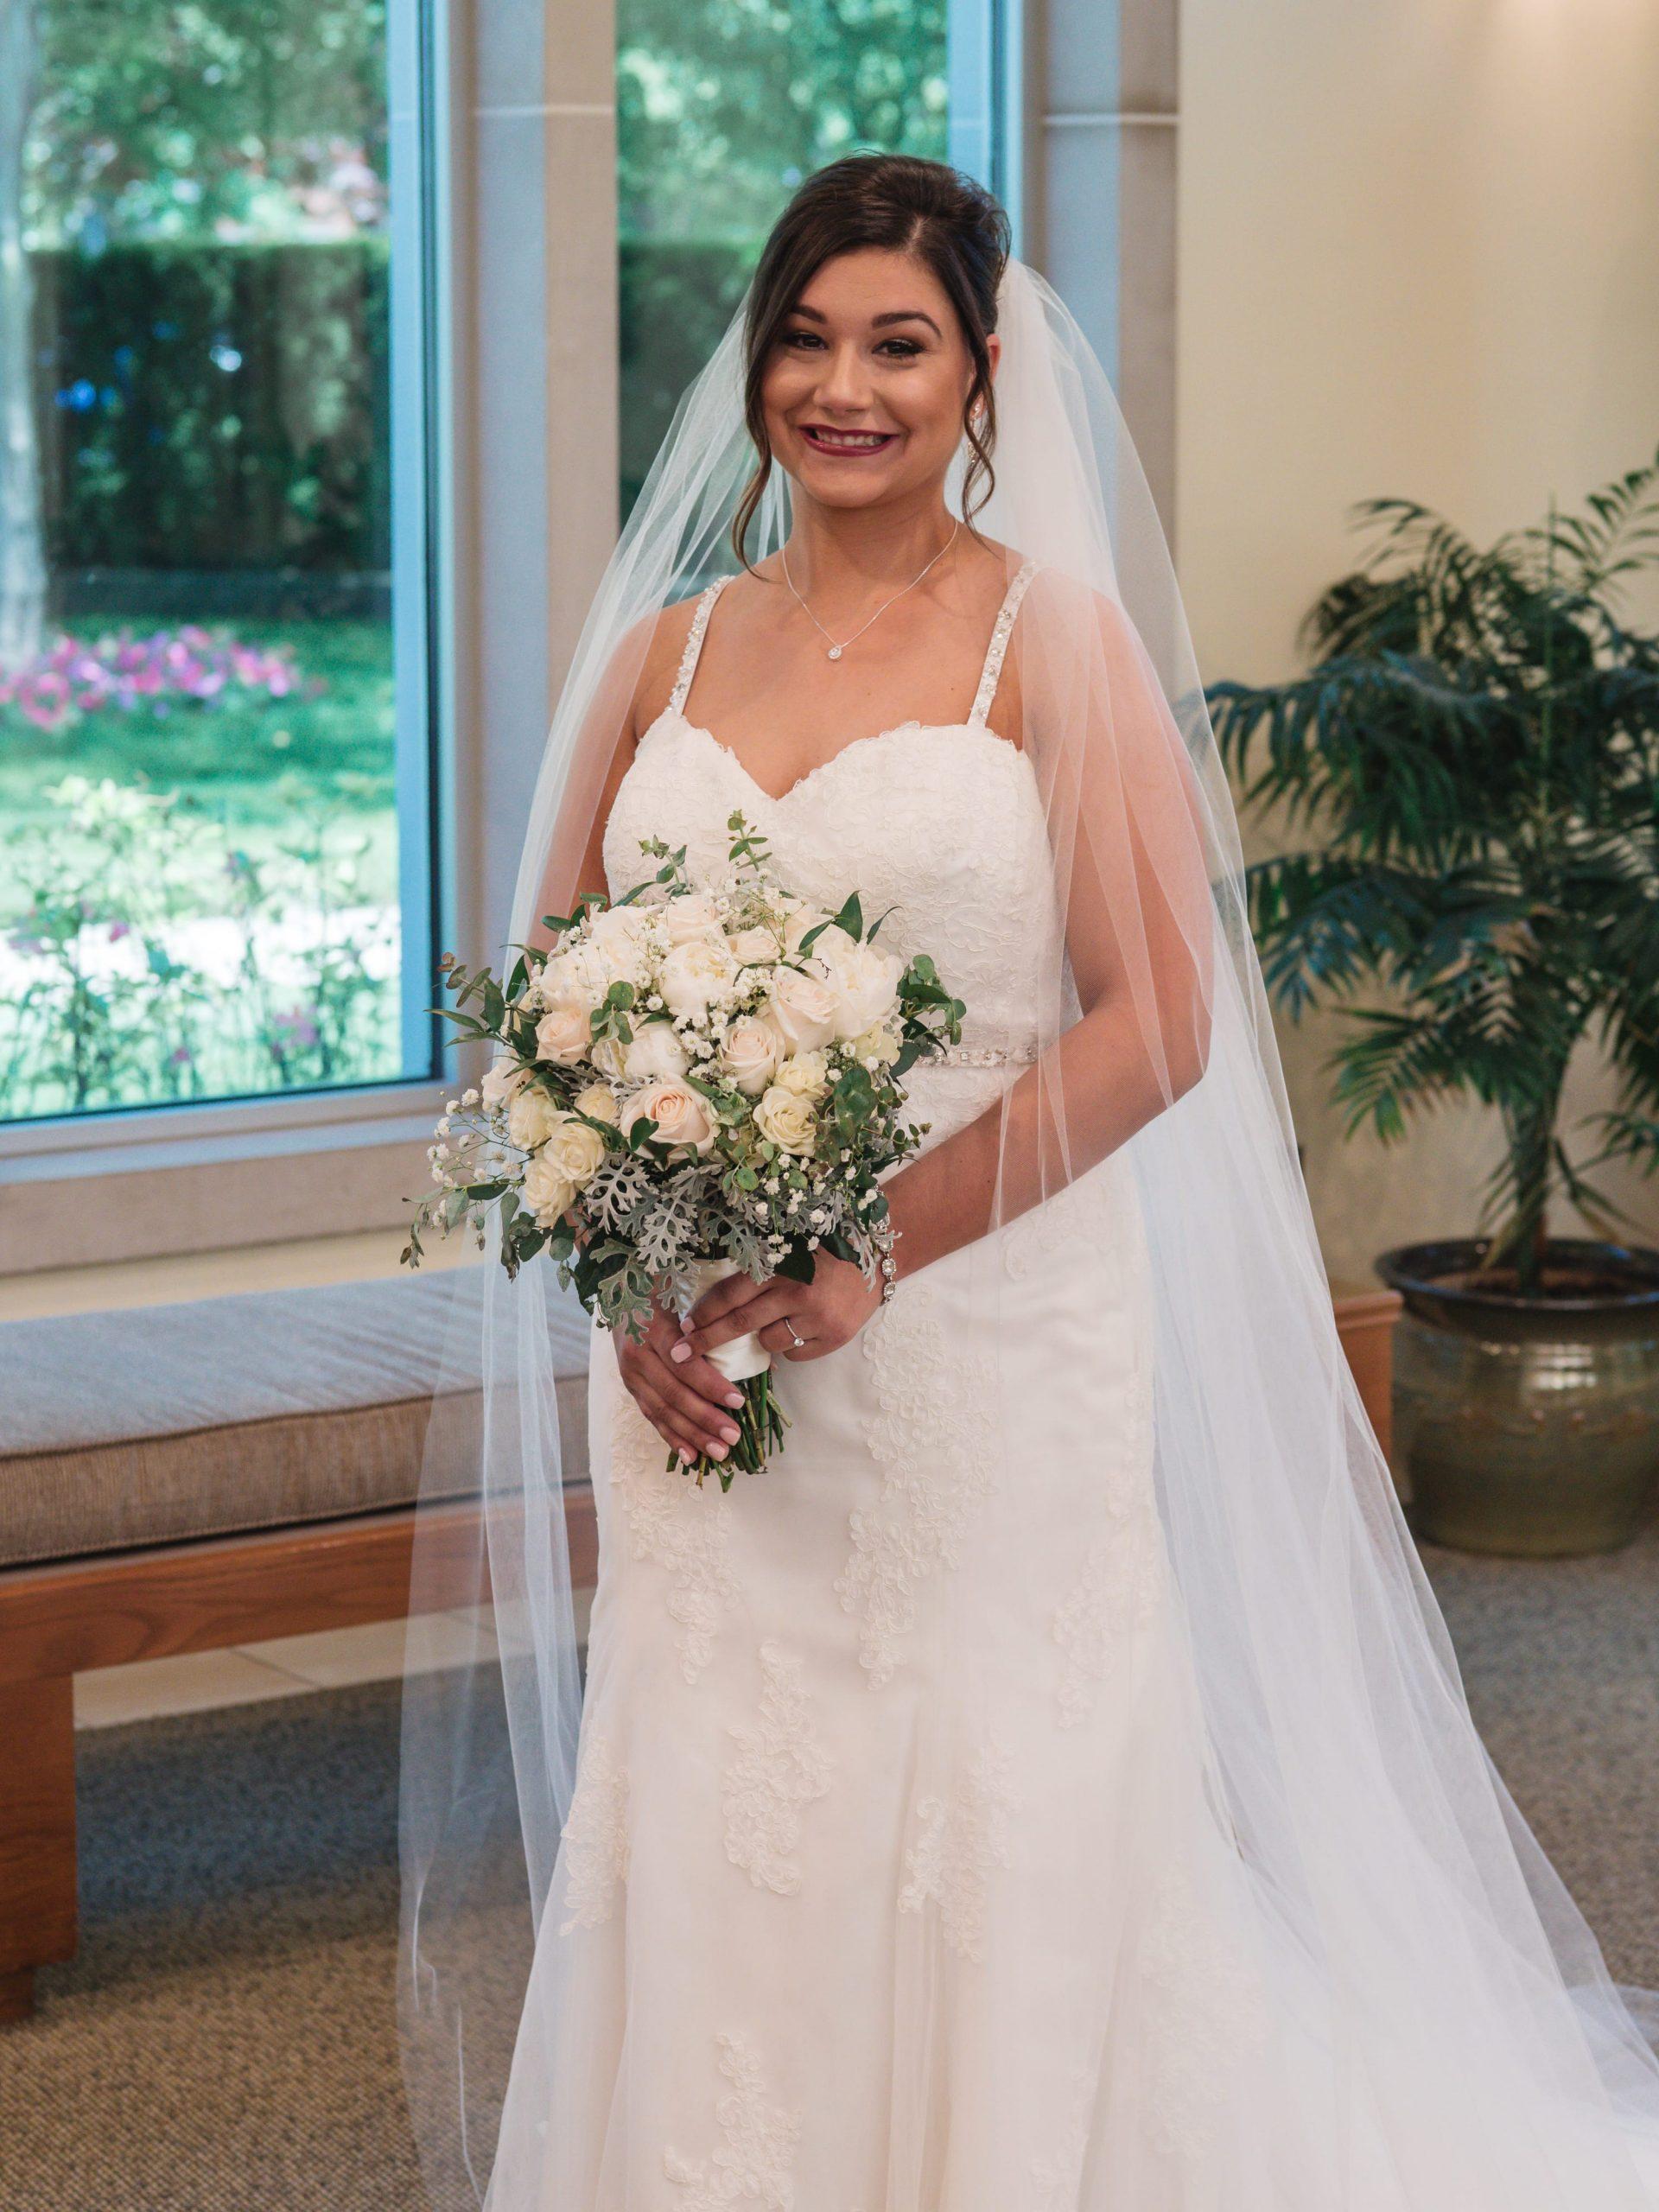 bride before wedding ceremony